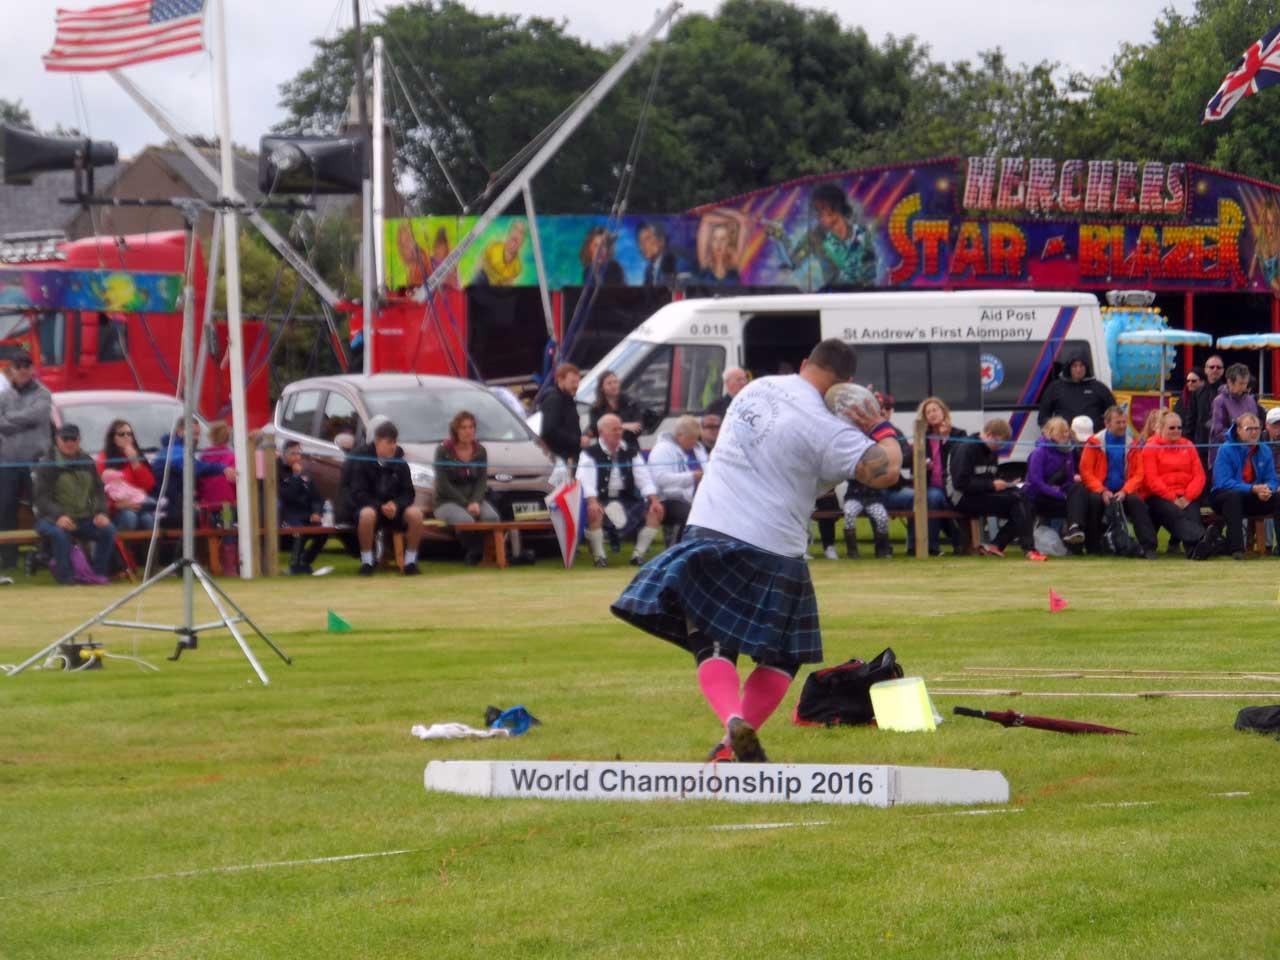 Highland games jakarta